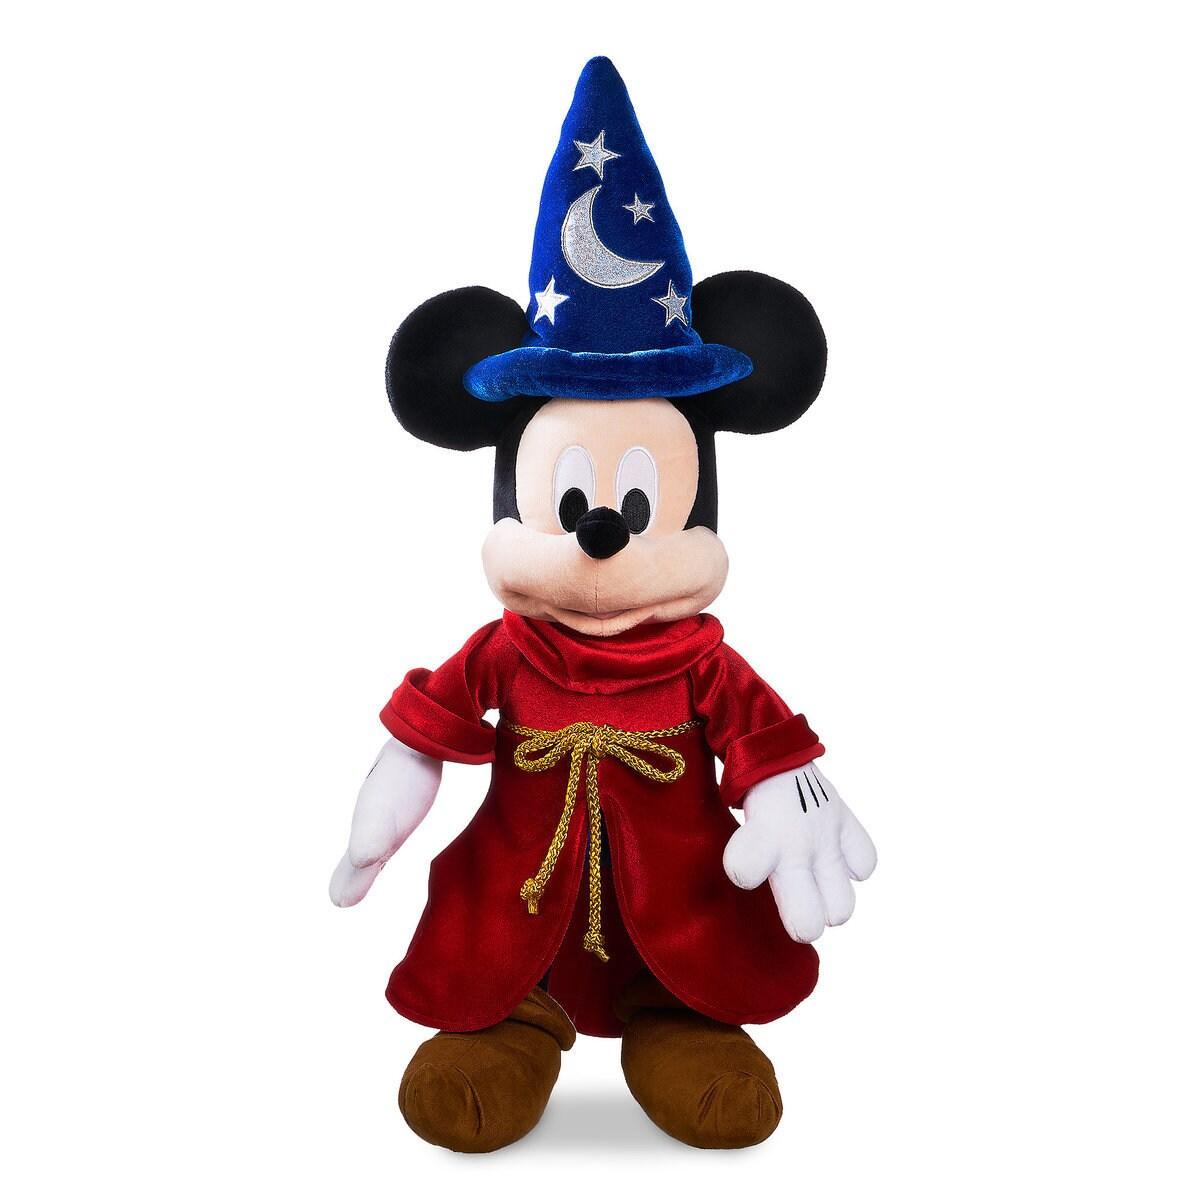 6d10b7919b80bf Sorcerer Mickey Mouse Plush - Medium - Personalizable